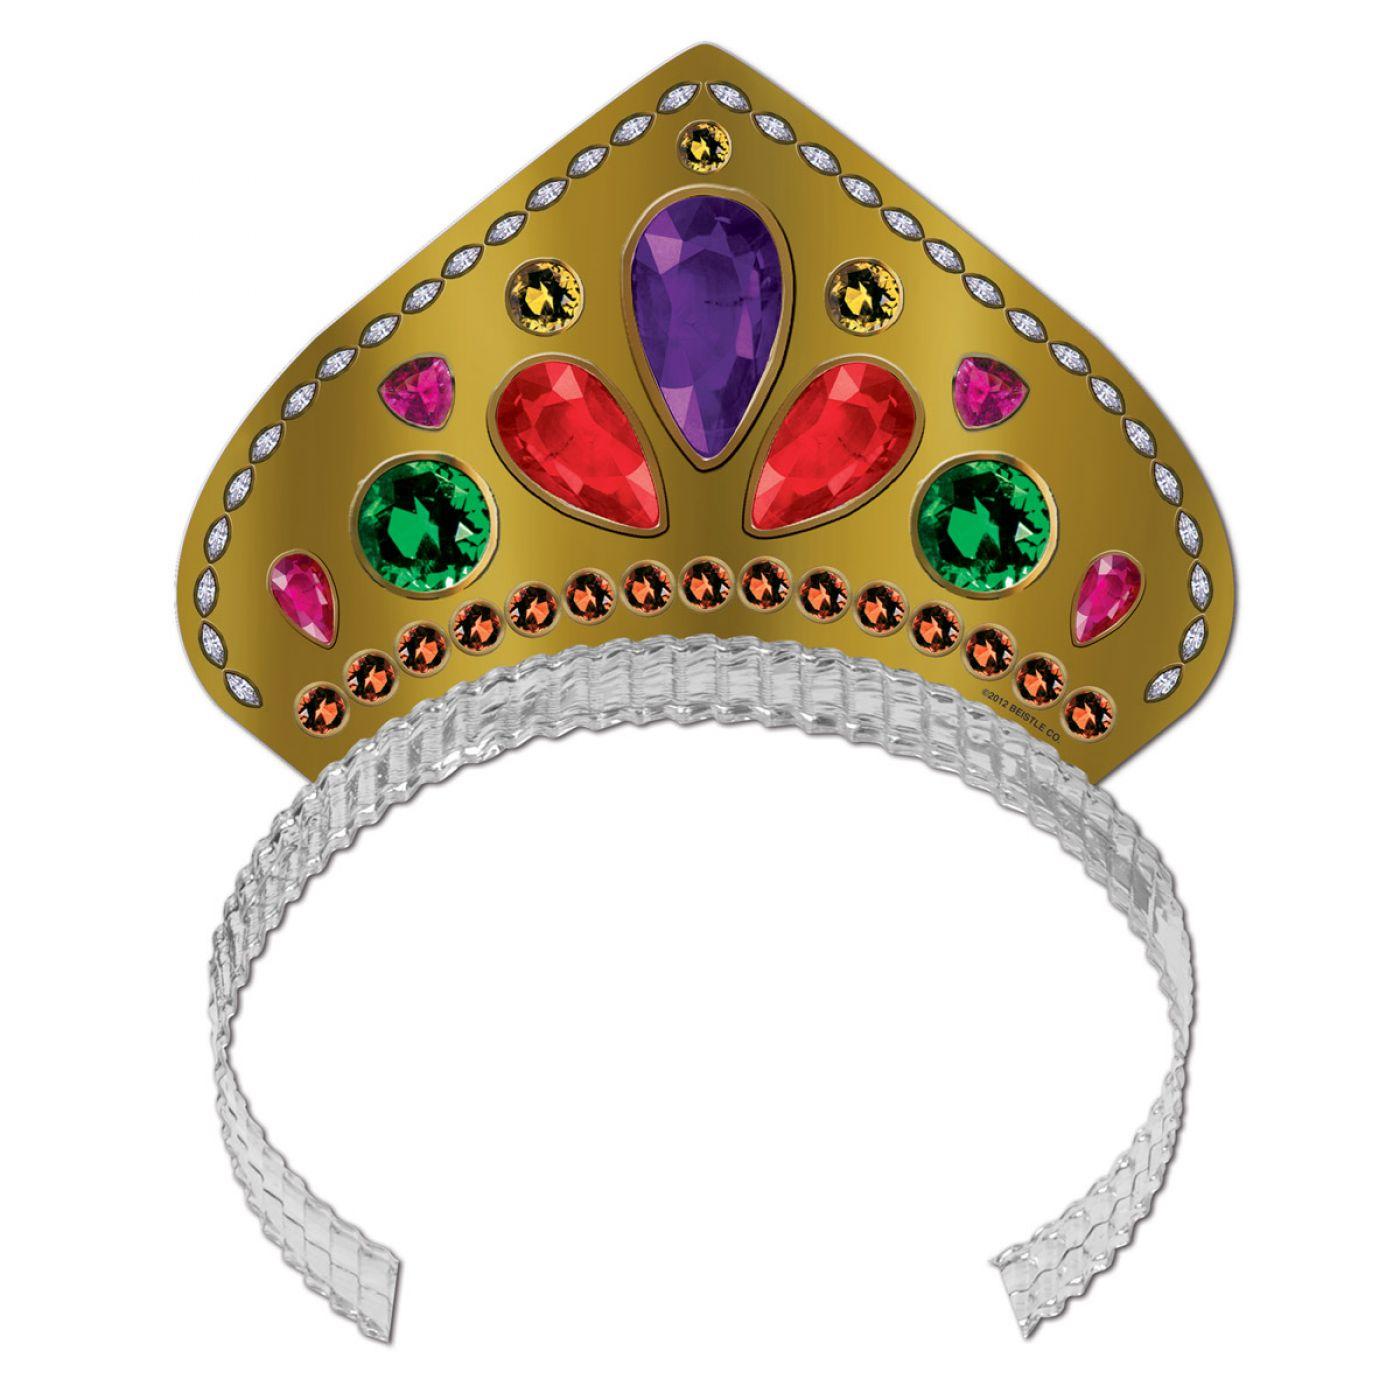 Printed Jeweled Tiara (72) image